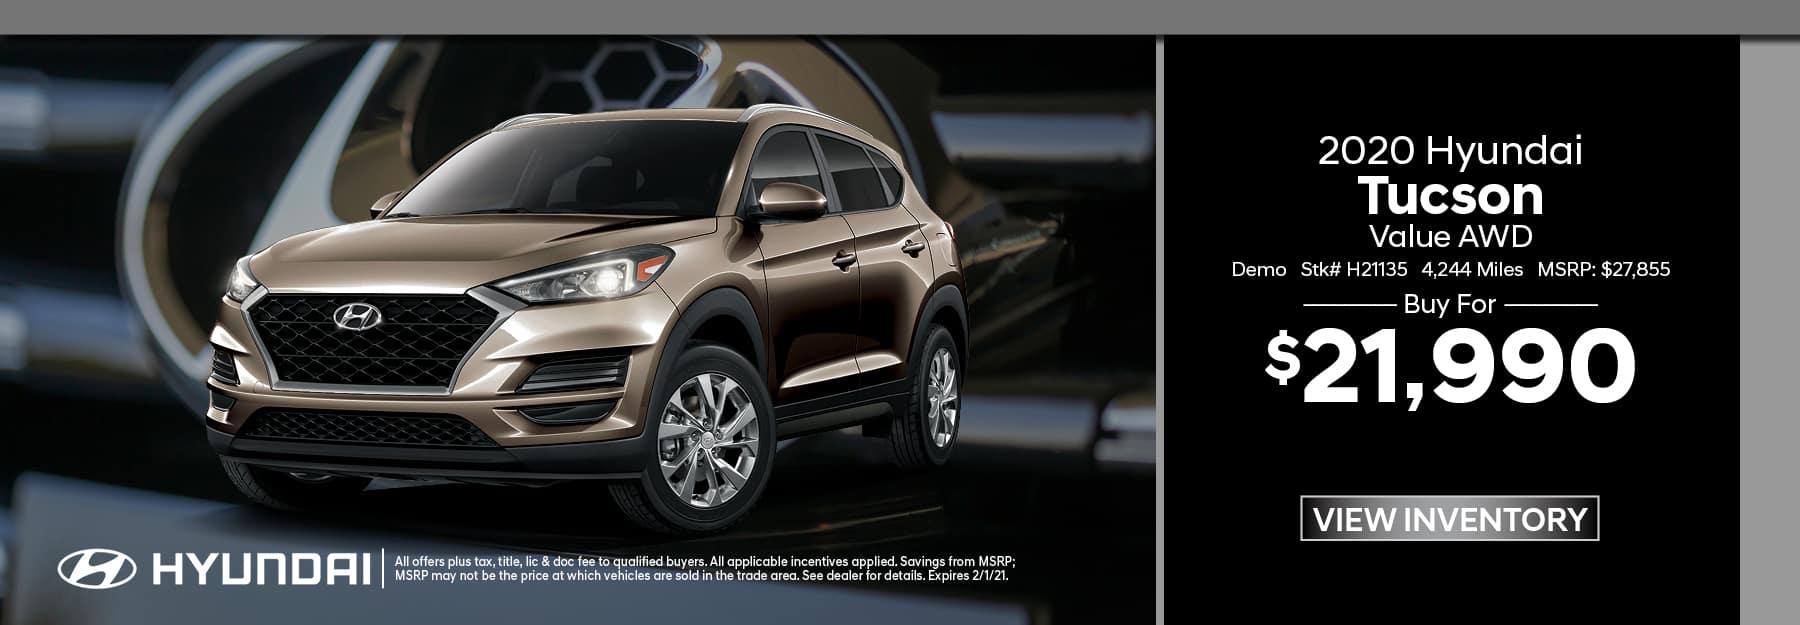 2020 Hyundai Tucson Demo